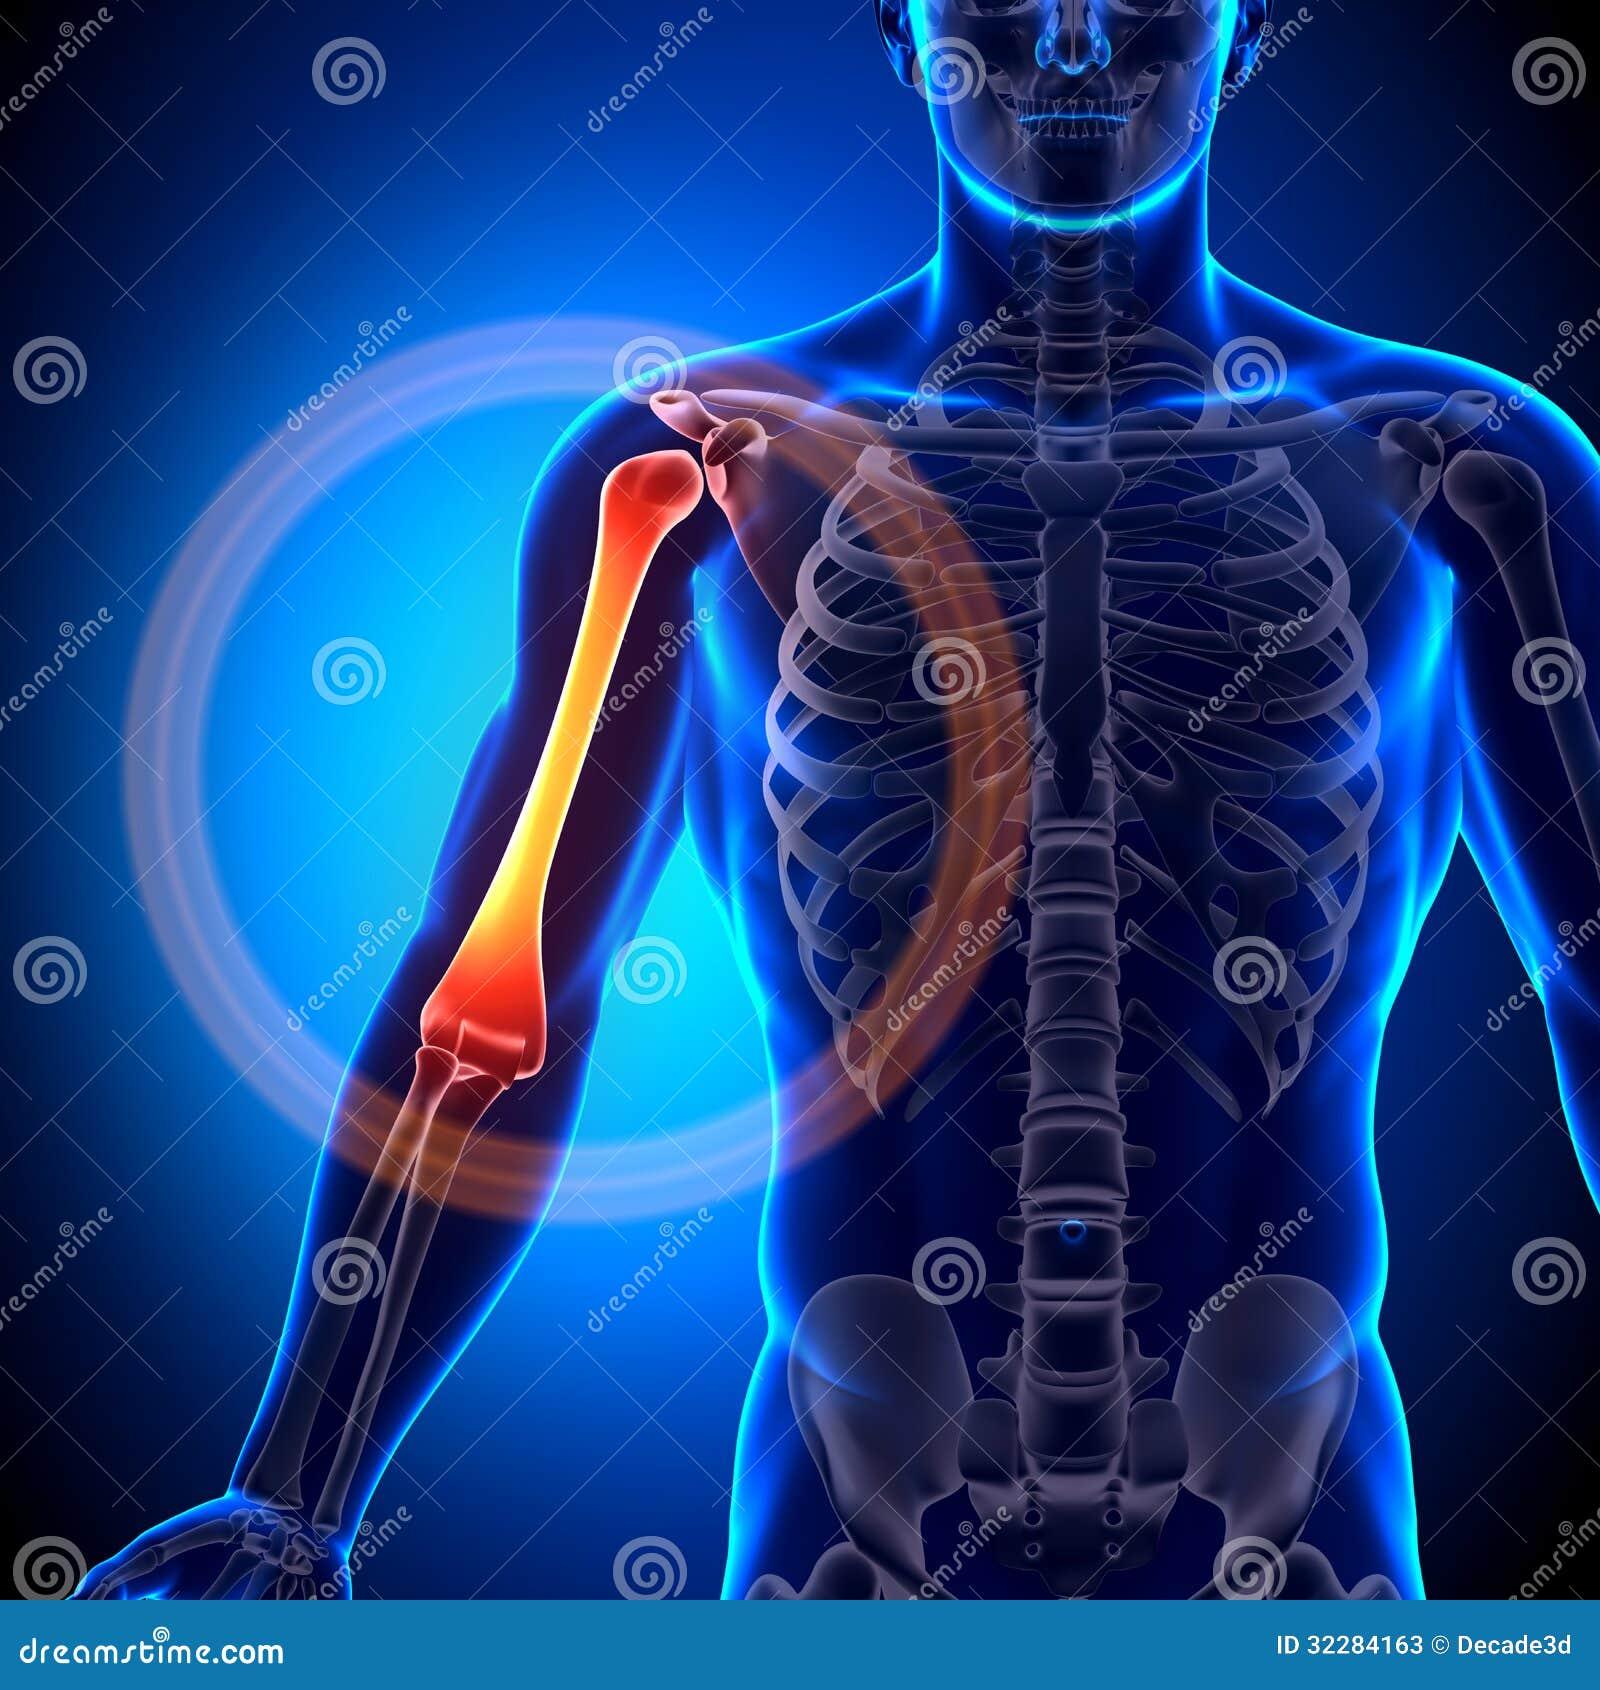 Humerus / Arm Anatomy - Anatomy Bones Stock Photos - Image ... X Ray Human Skull